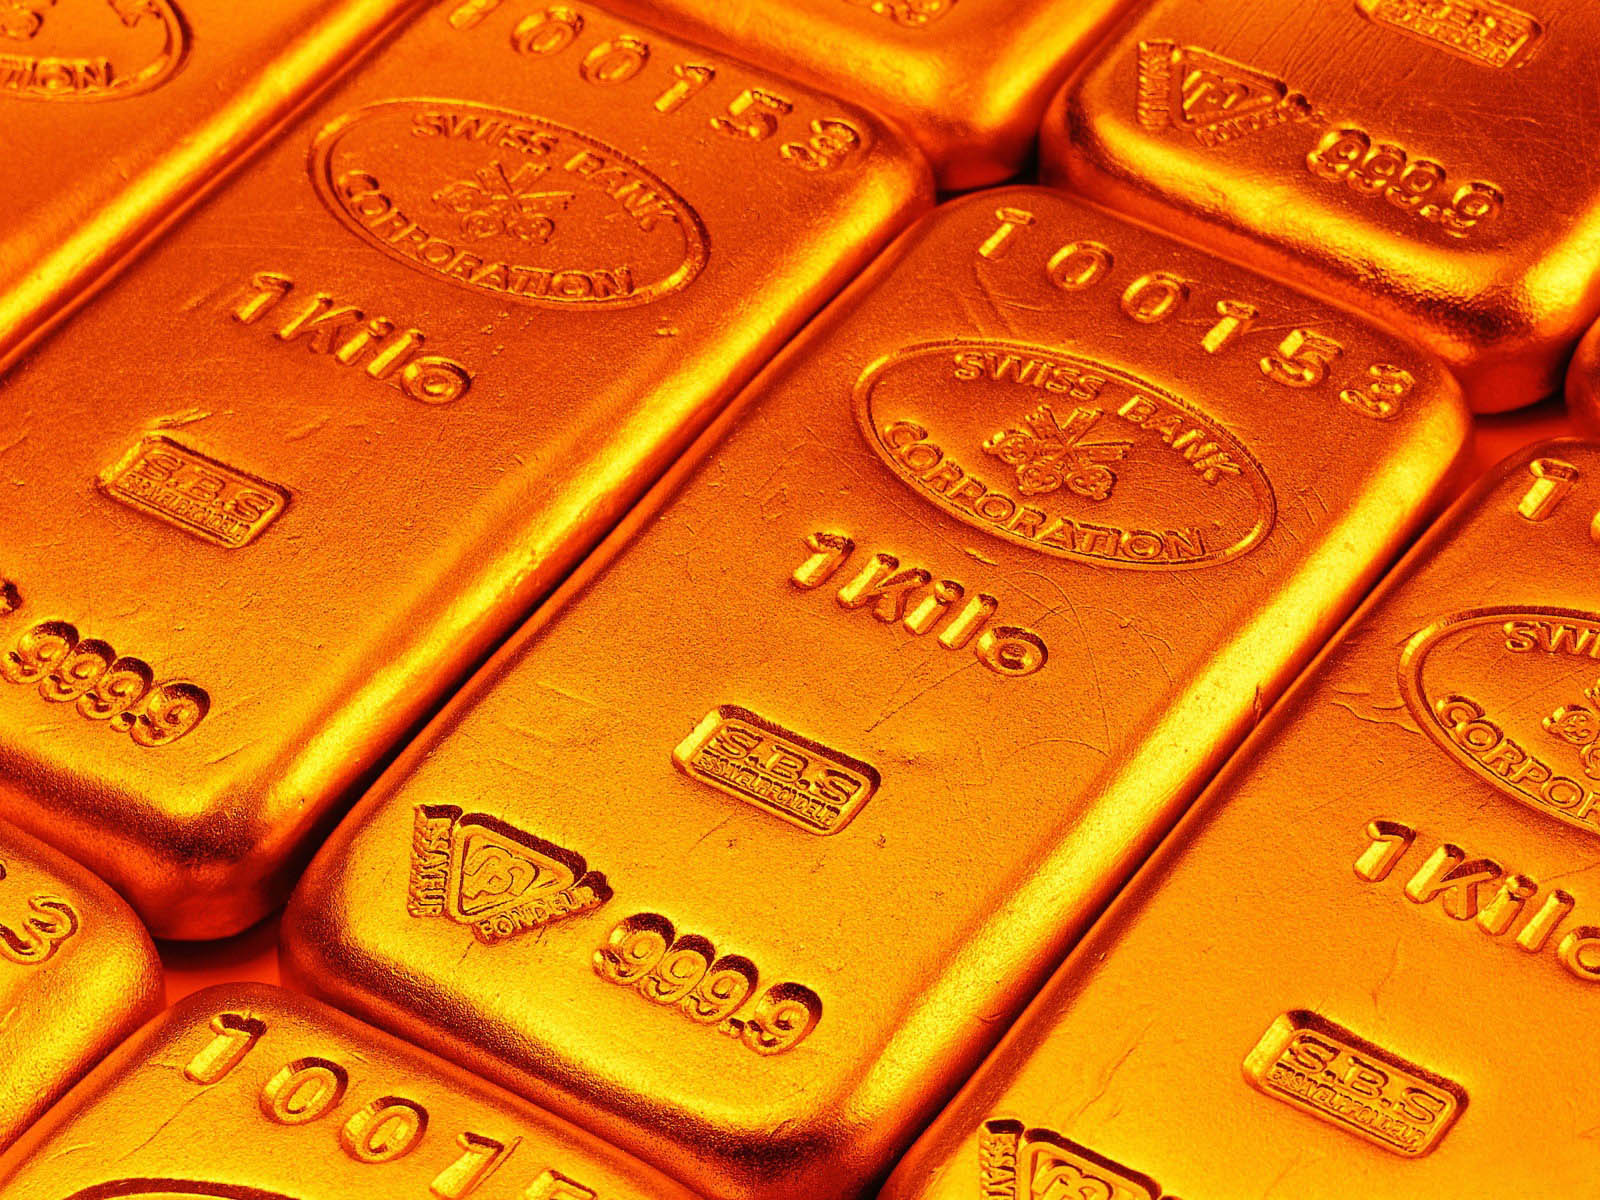 http://1.bp.blogspot.com/-4NPdNJKQ0ZA/UHbVMf4BbjI/AAAAAAAALWQ/JehoYlbWDzo/s1600/Gold+Wallpapers+2.jpg